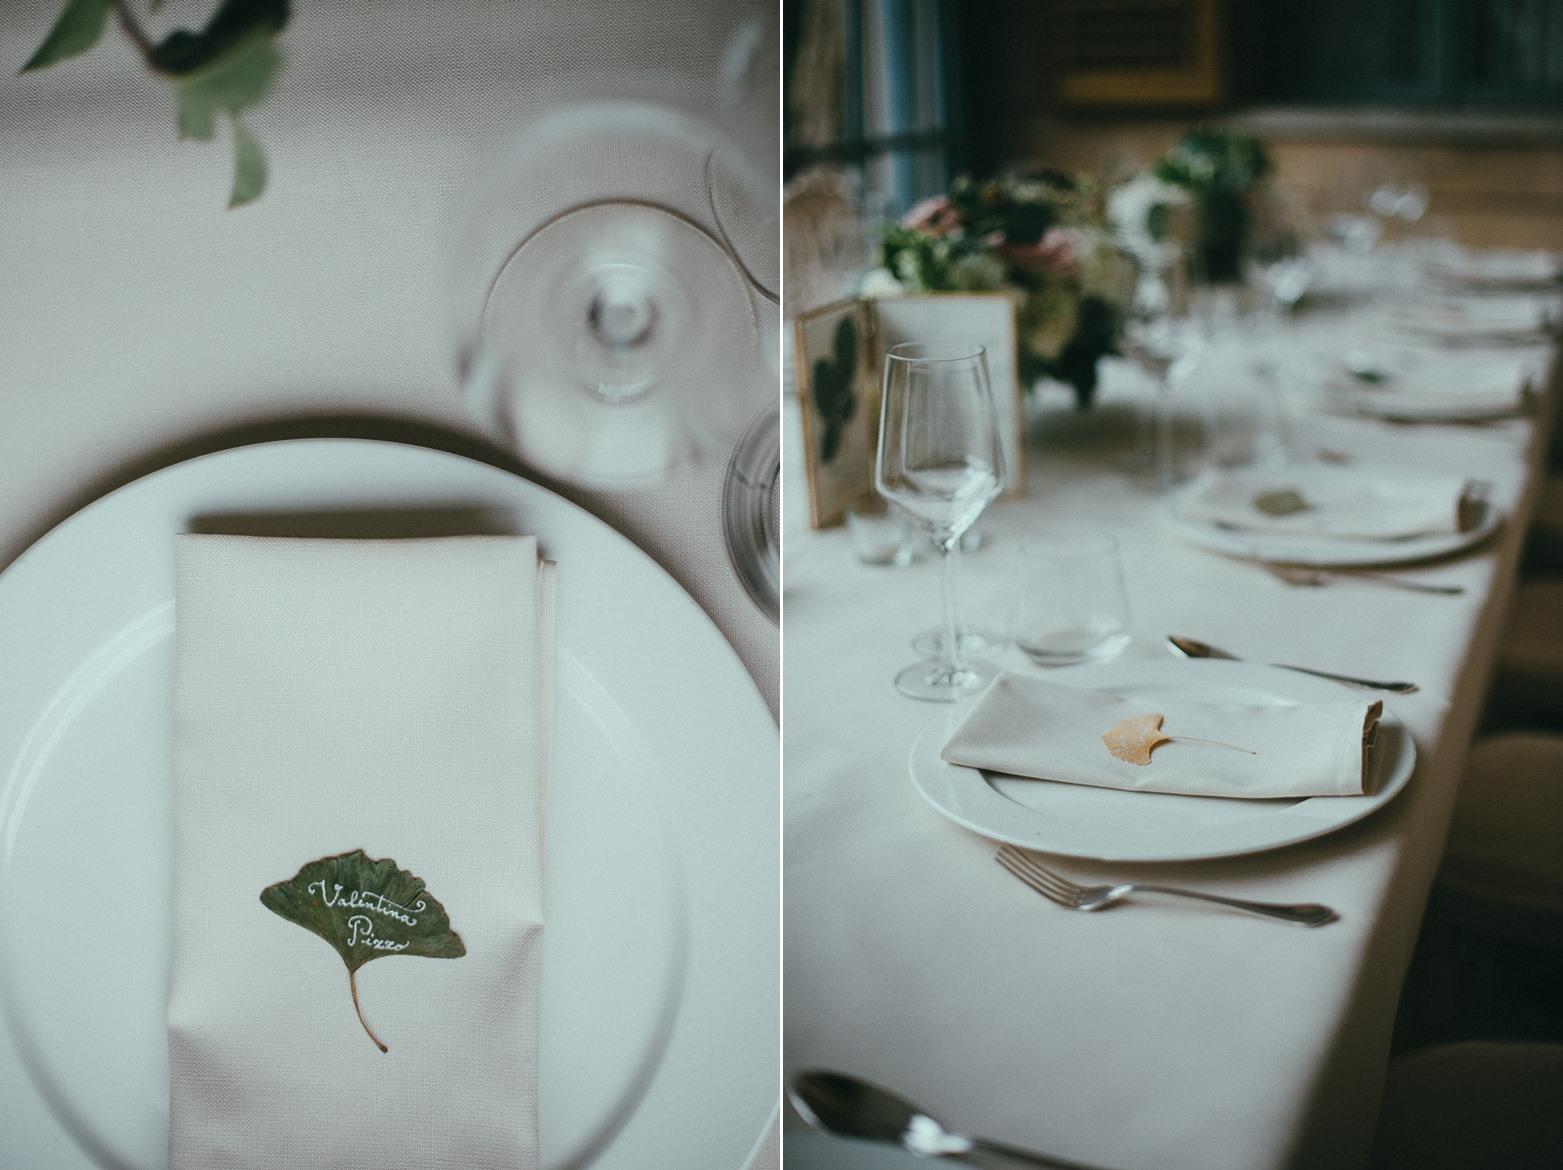 87-wedding-table-setting.jpg